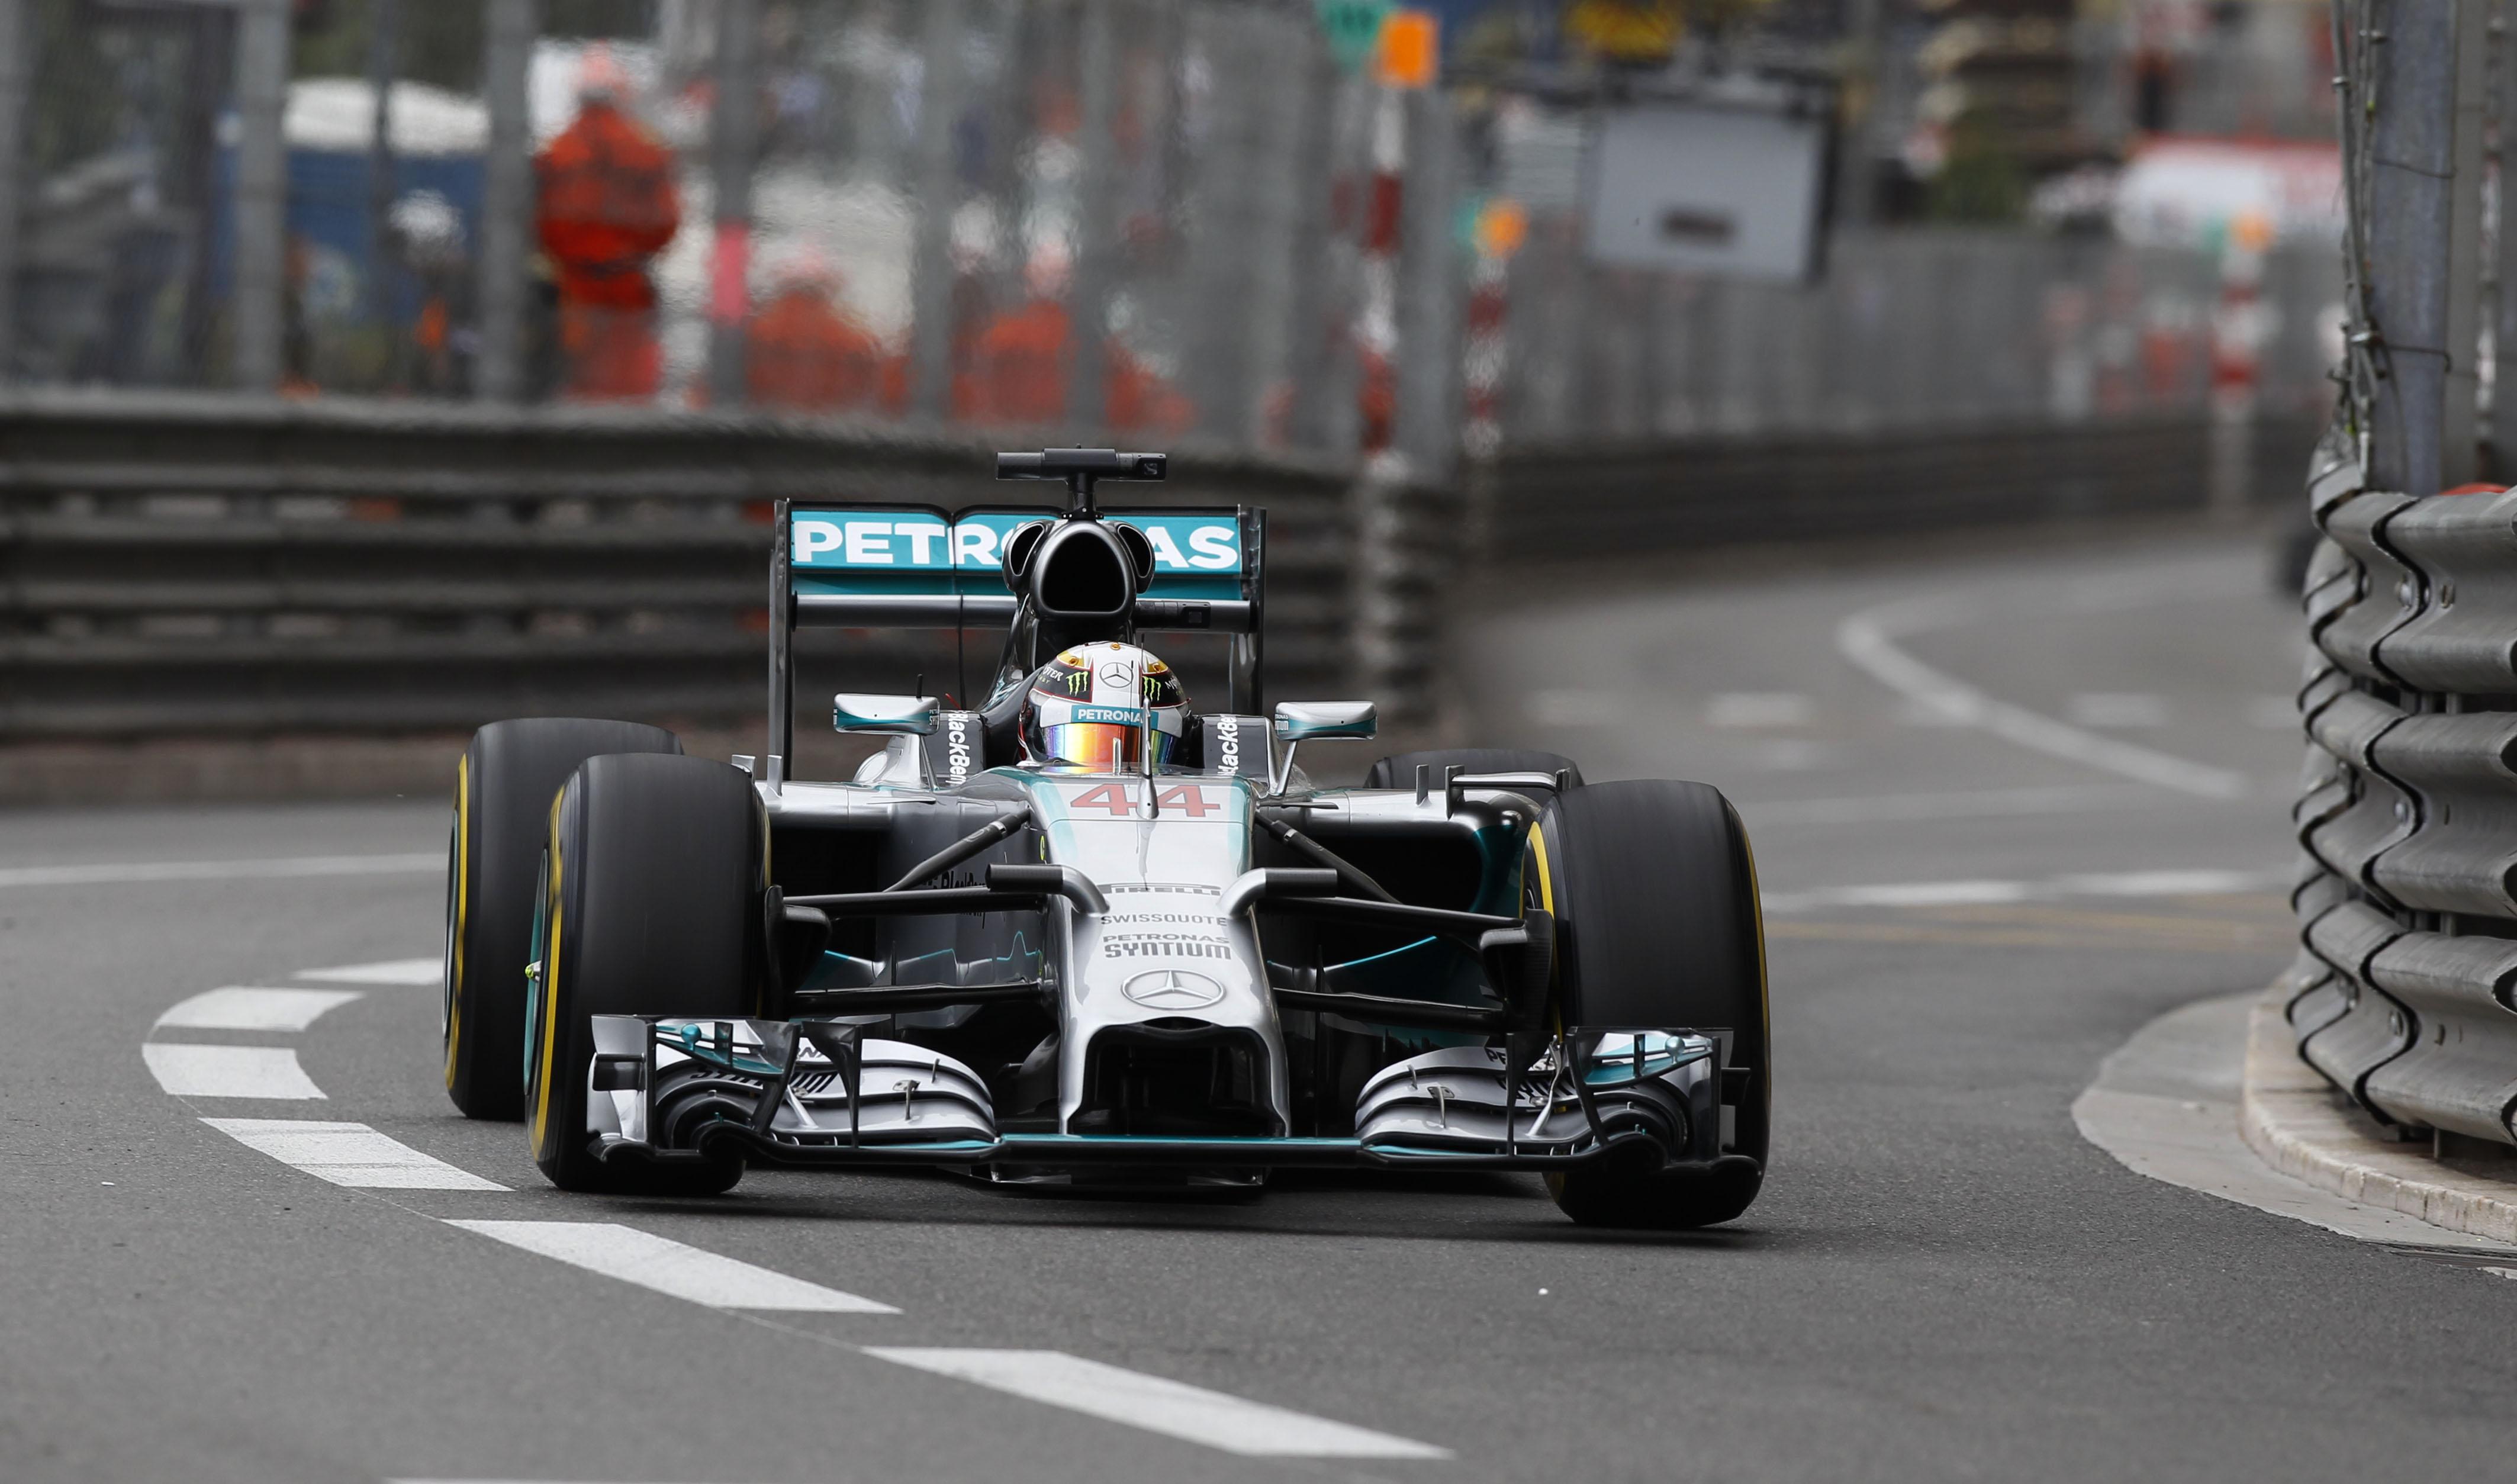 Gp di Monaco, Lewis Hamilton beffato